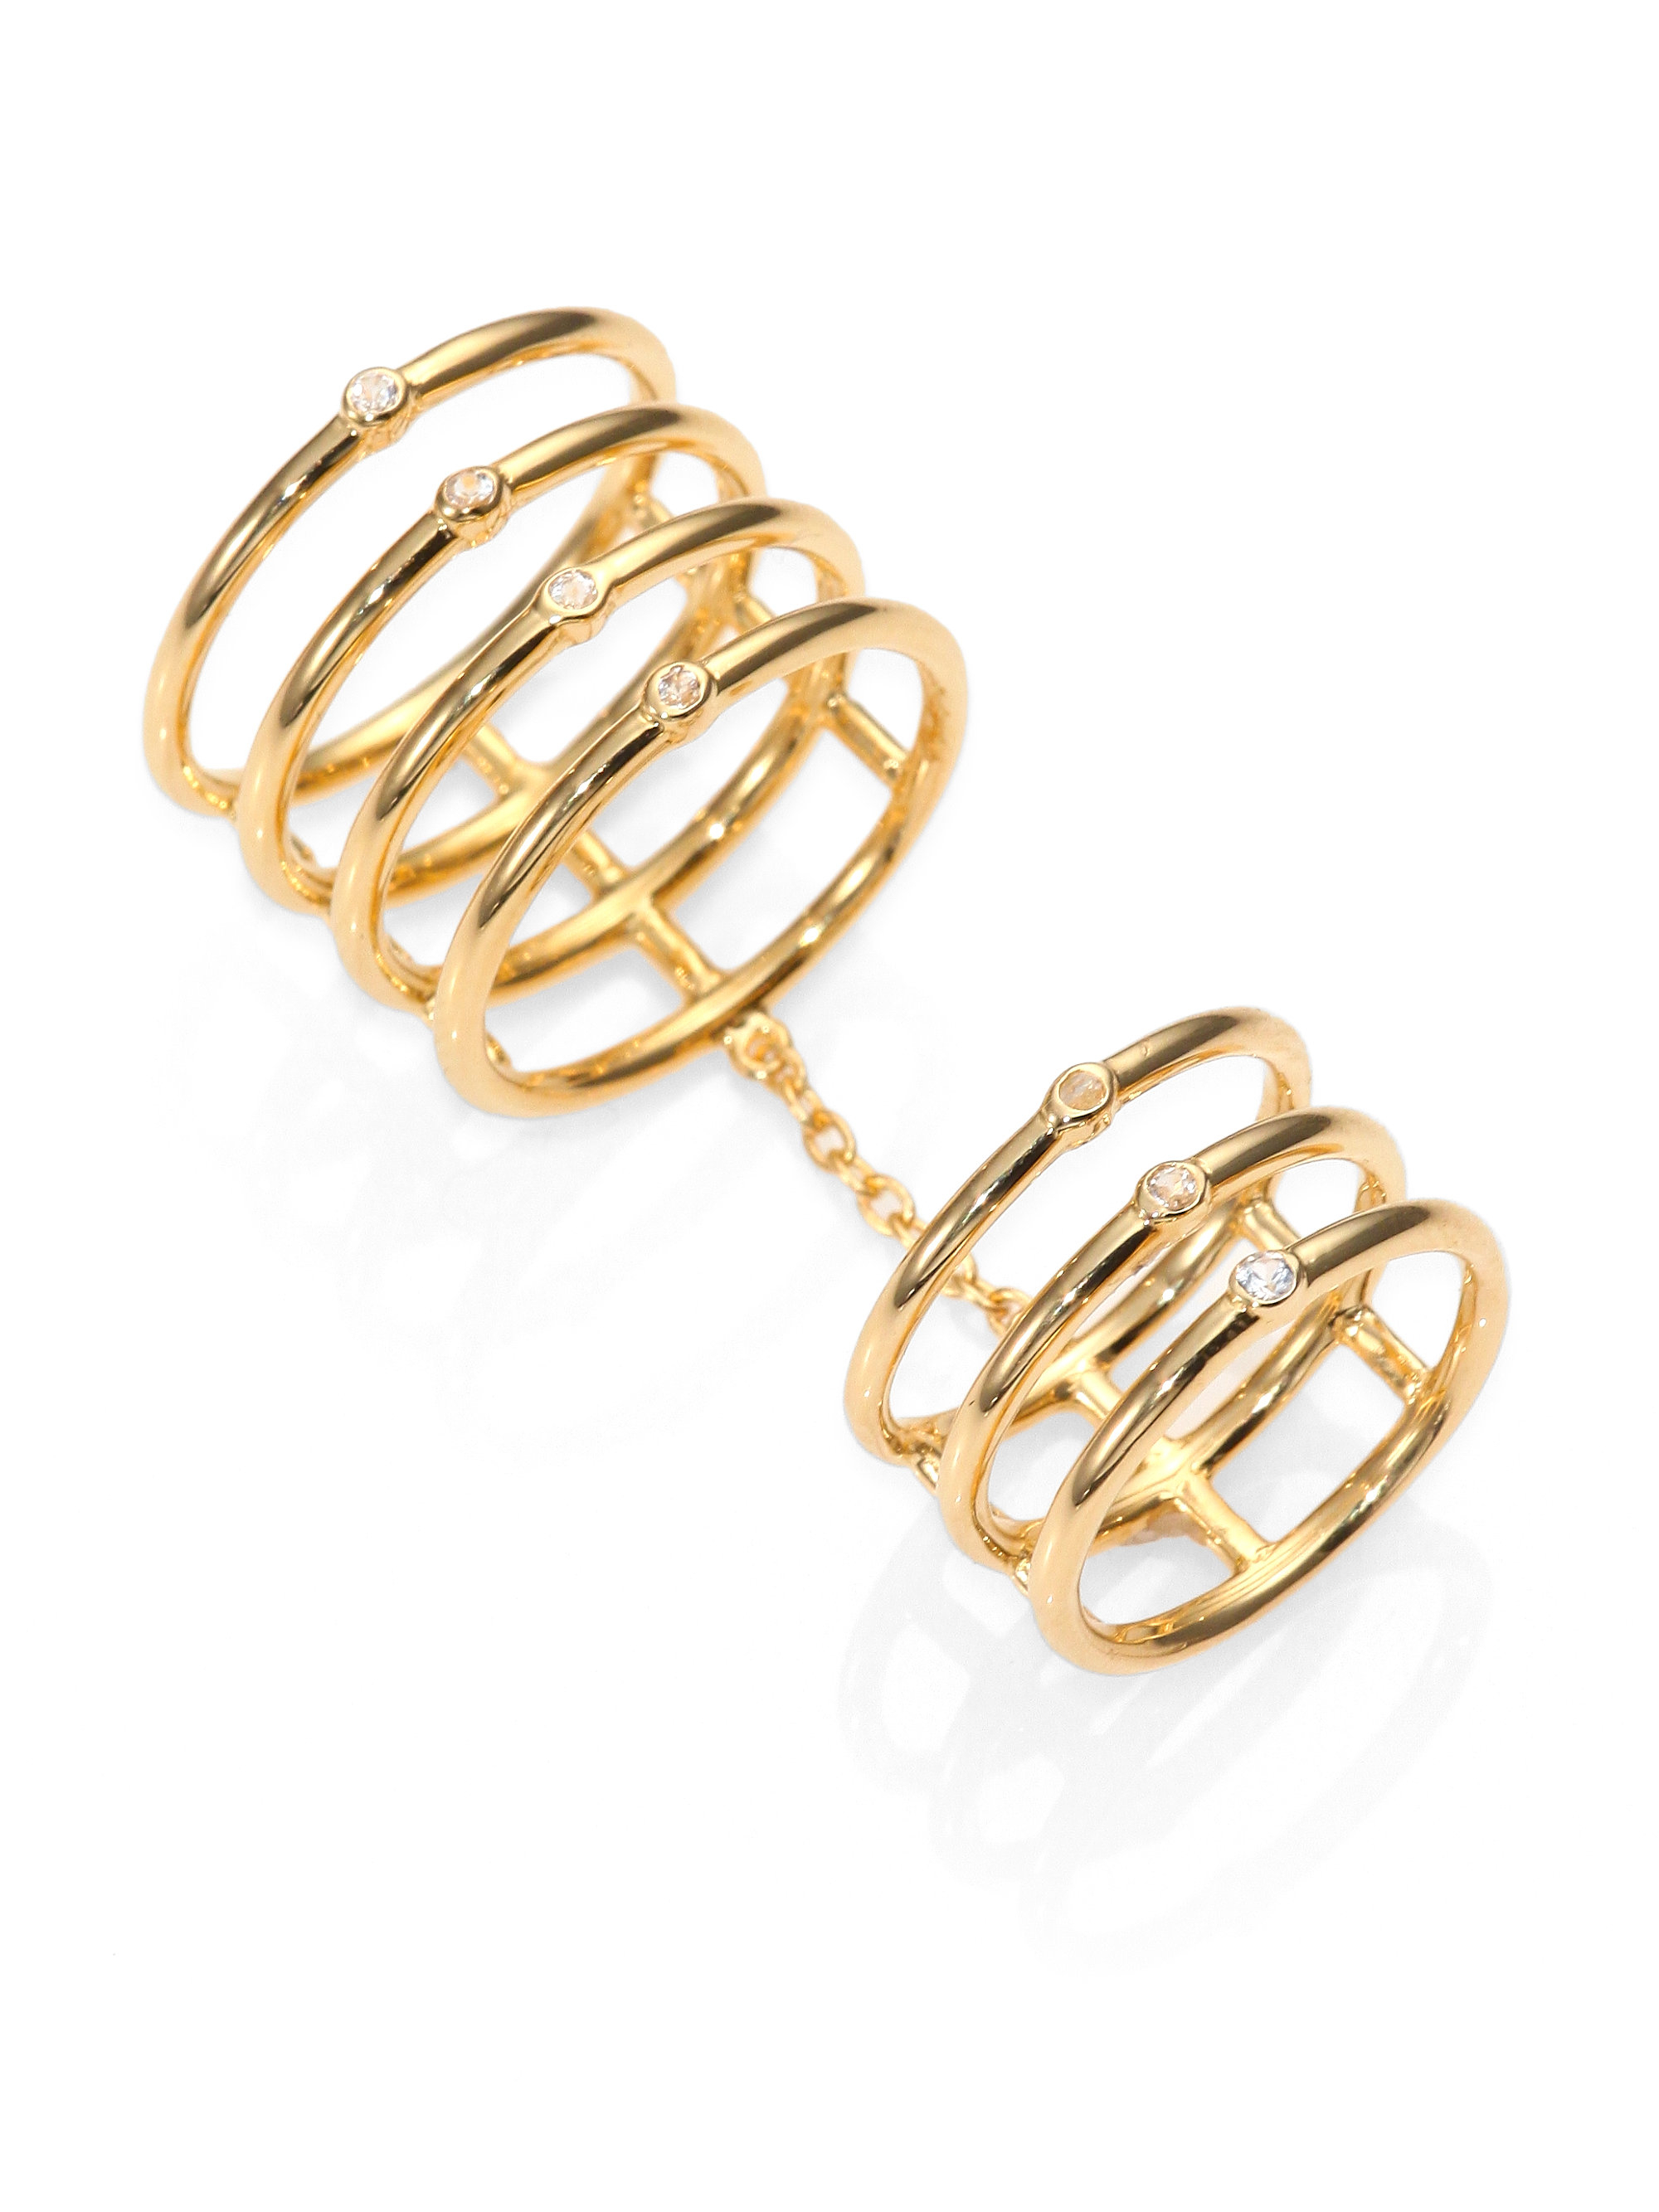 Vivienne Westwood Mens Jewelry Images Most Unique Watches Decorating Ideas 17 Best